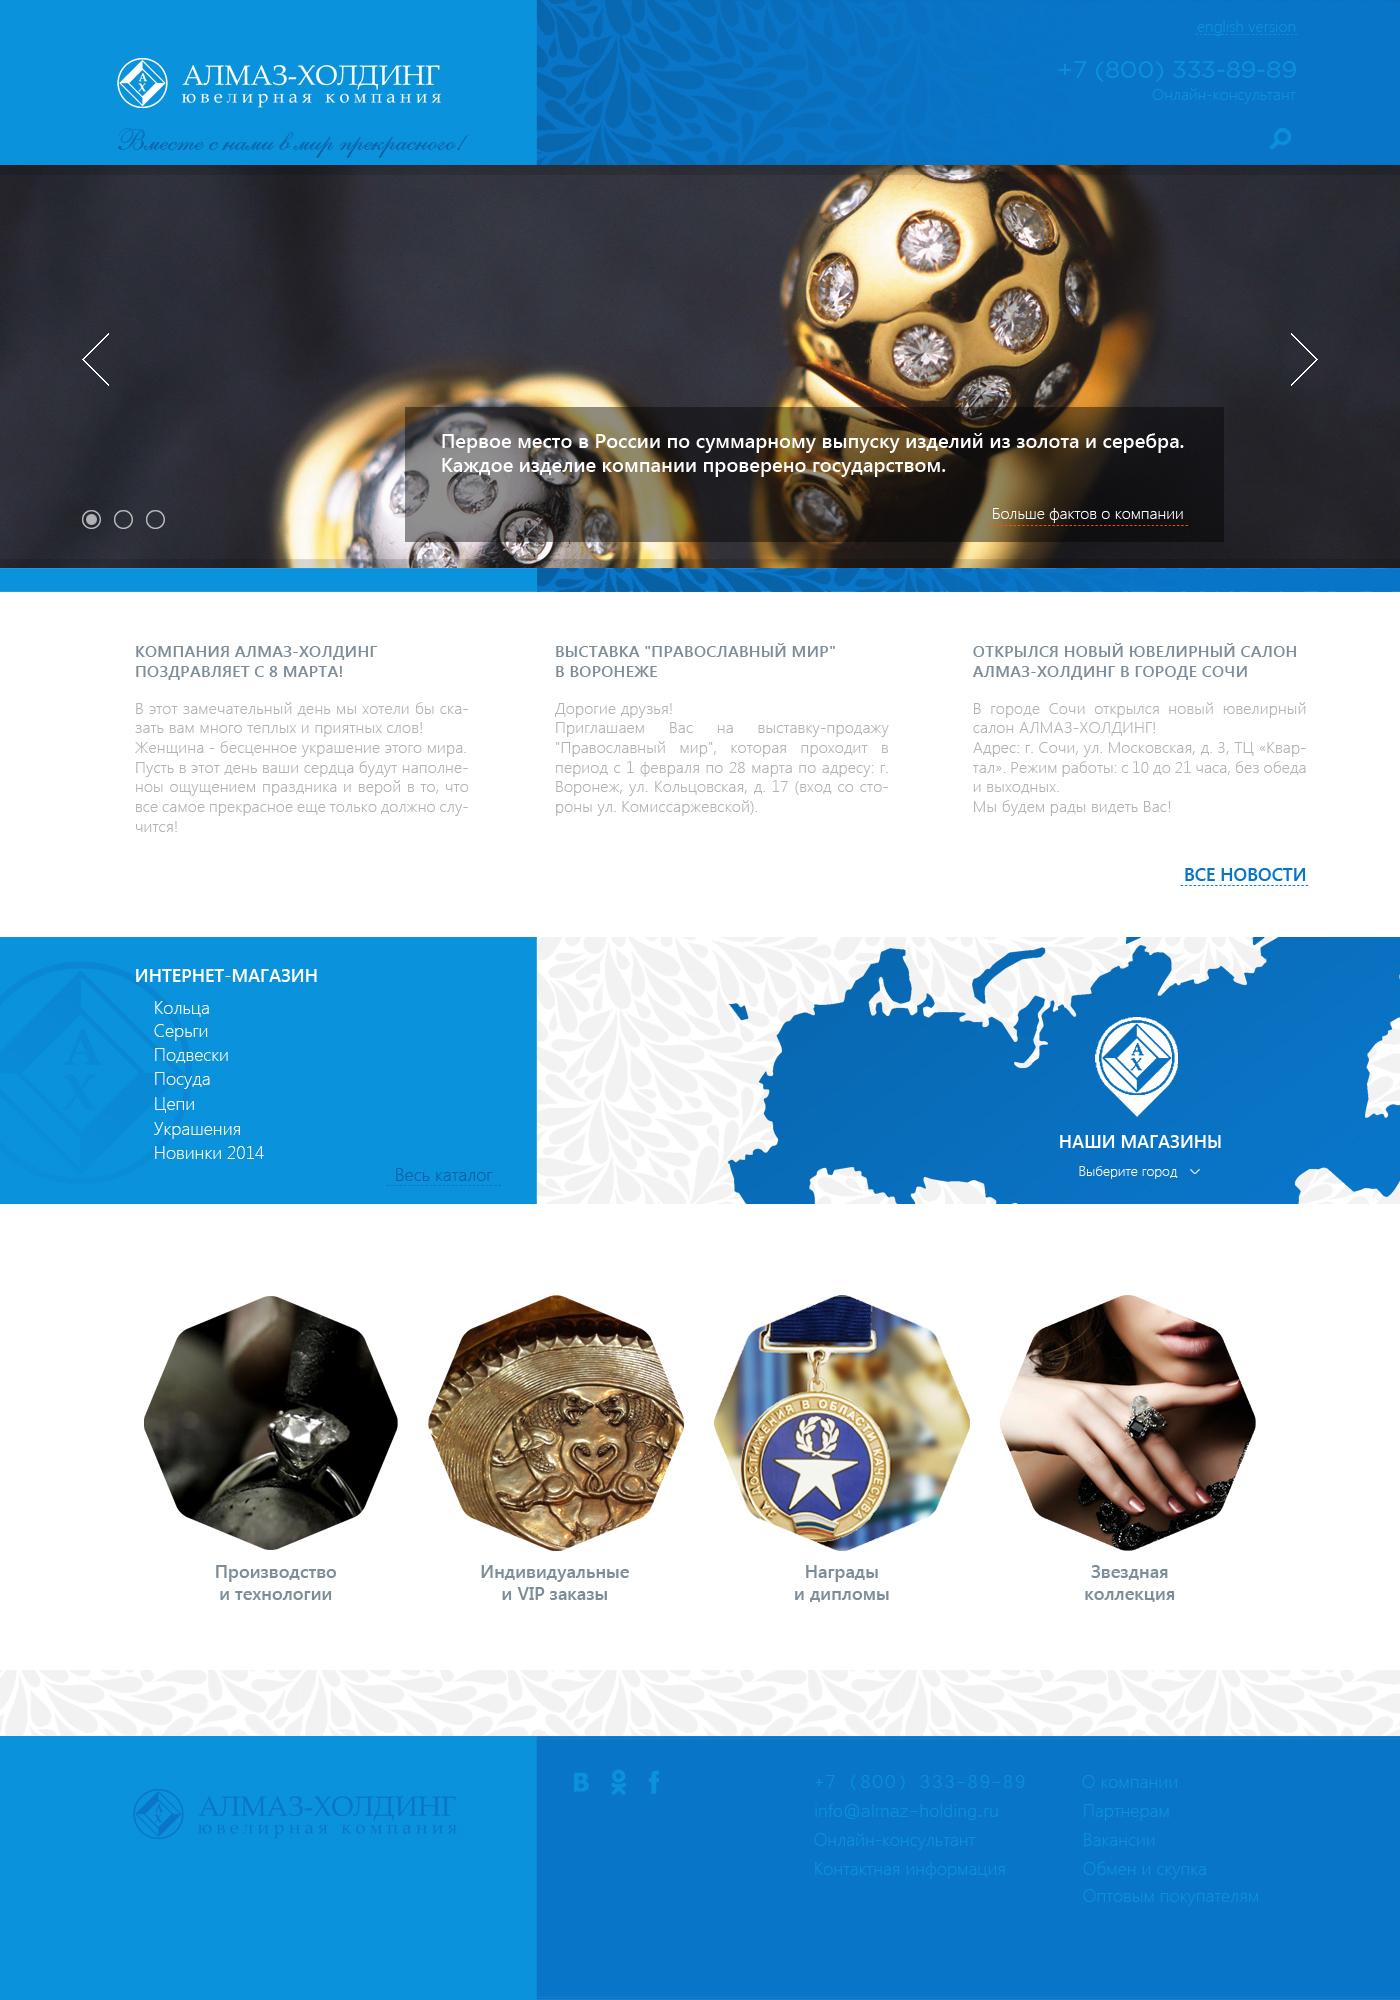 Дизайн сайта для ювелирной компании Алмаз-Холдинг фото f_910531f3bc6e22fe.jpg